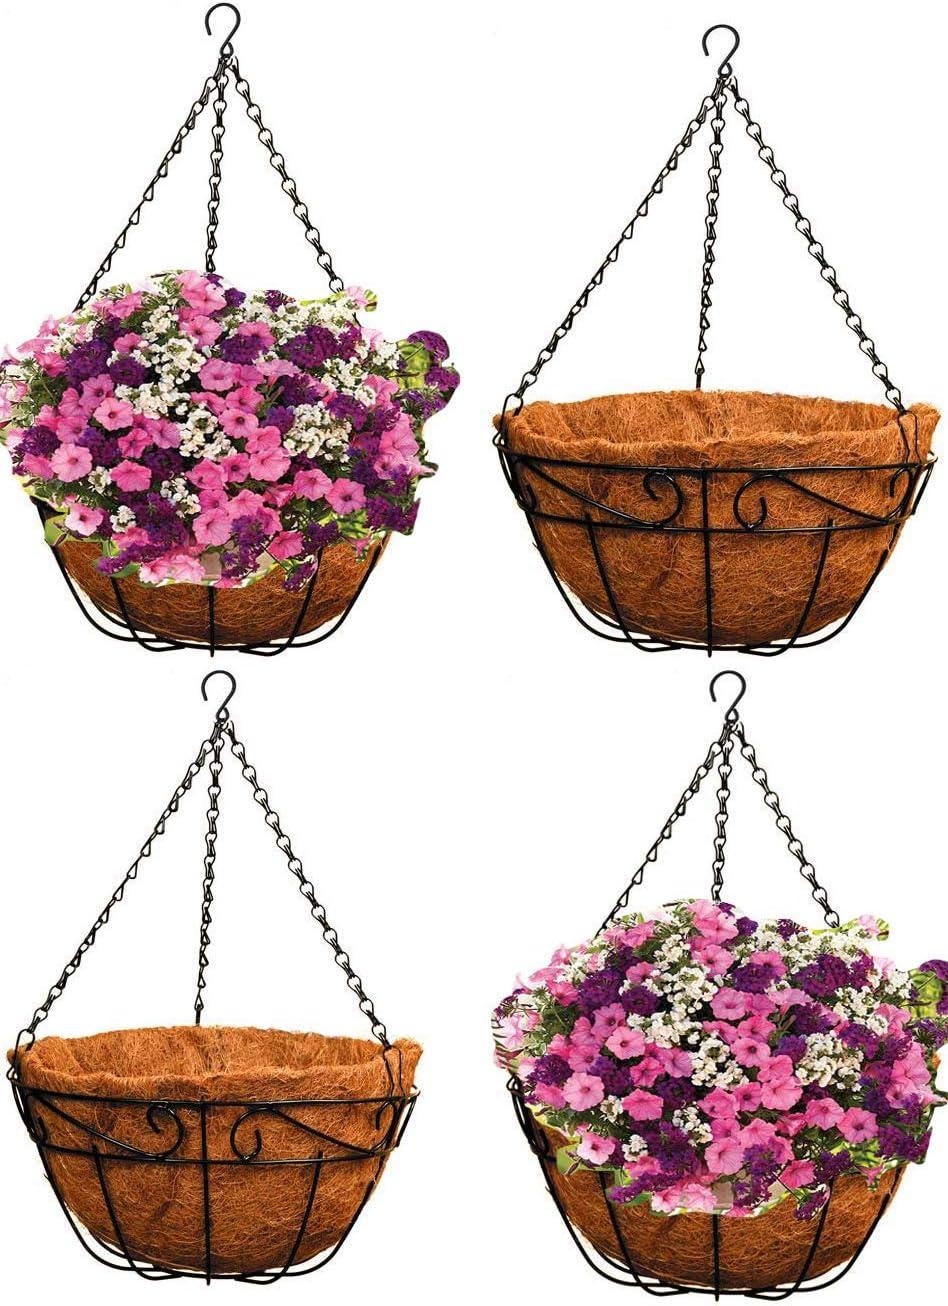 Wall Hanging Flower Pots Garden Balcony Basket Plant Pot Planter Ship Decor B5M8